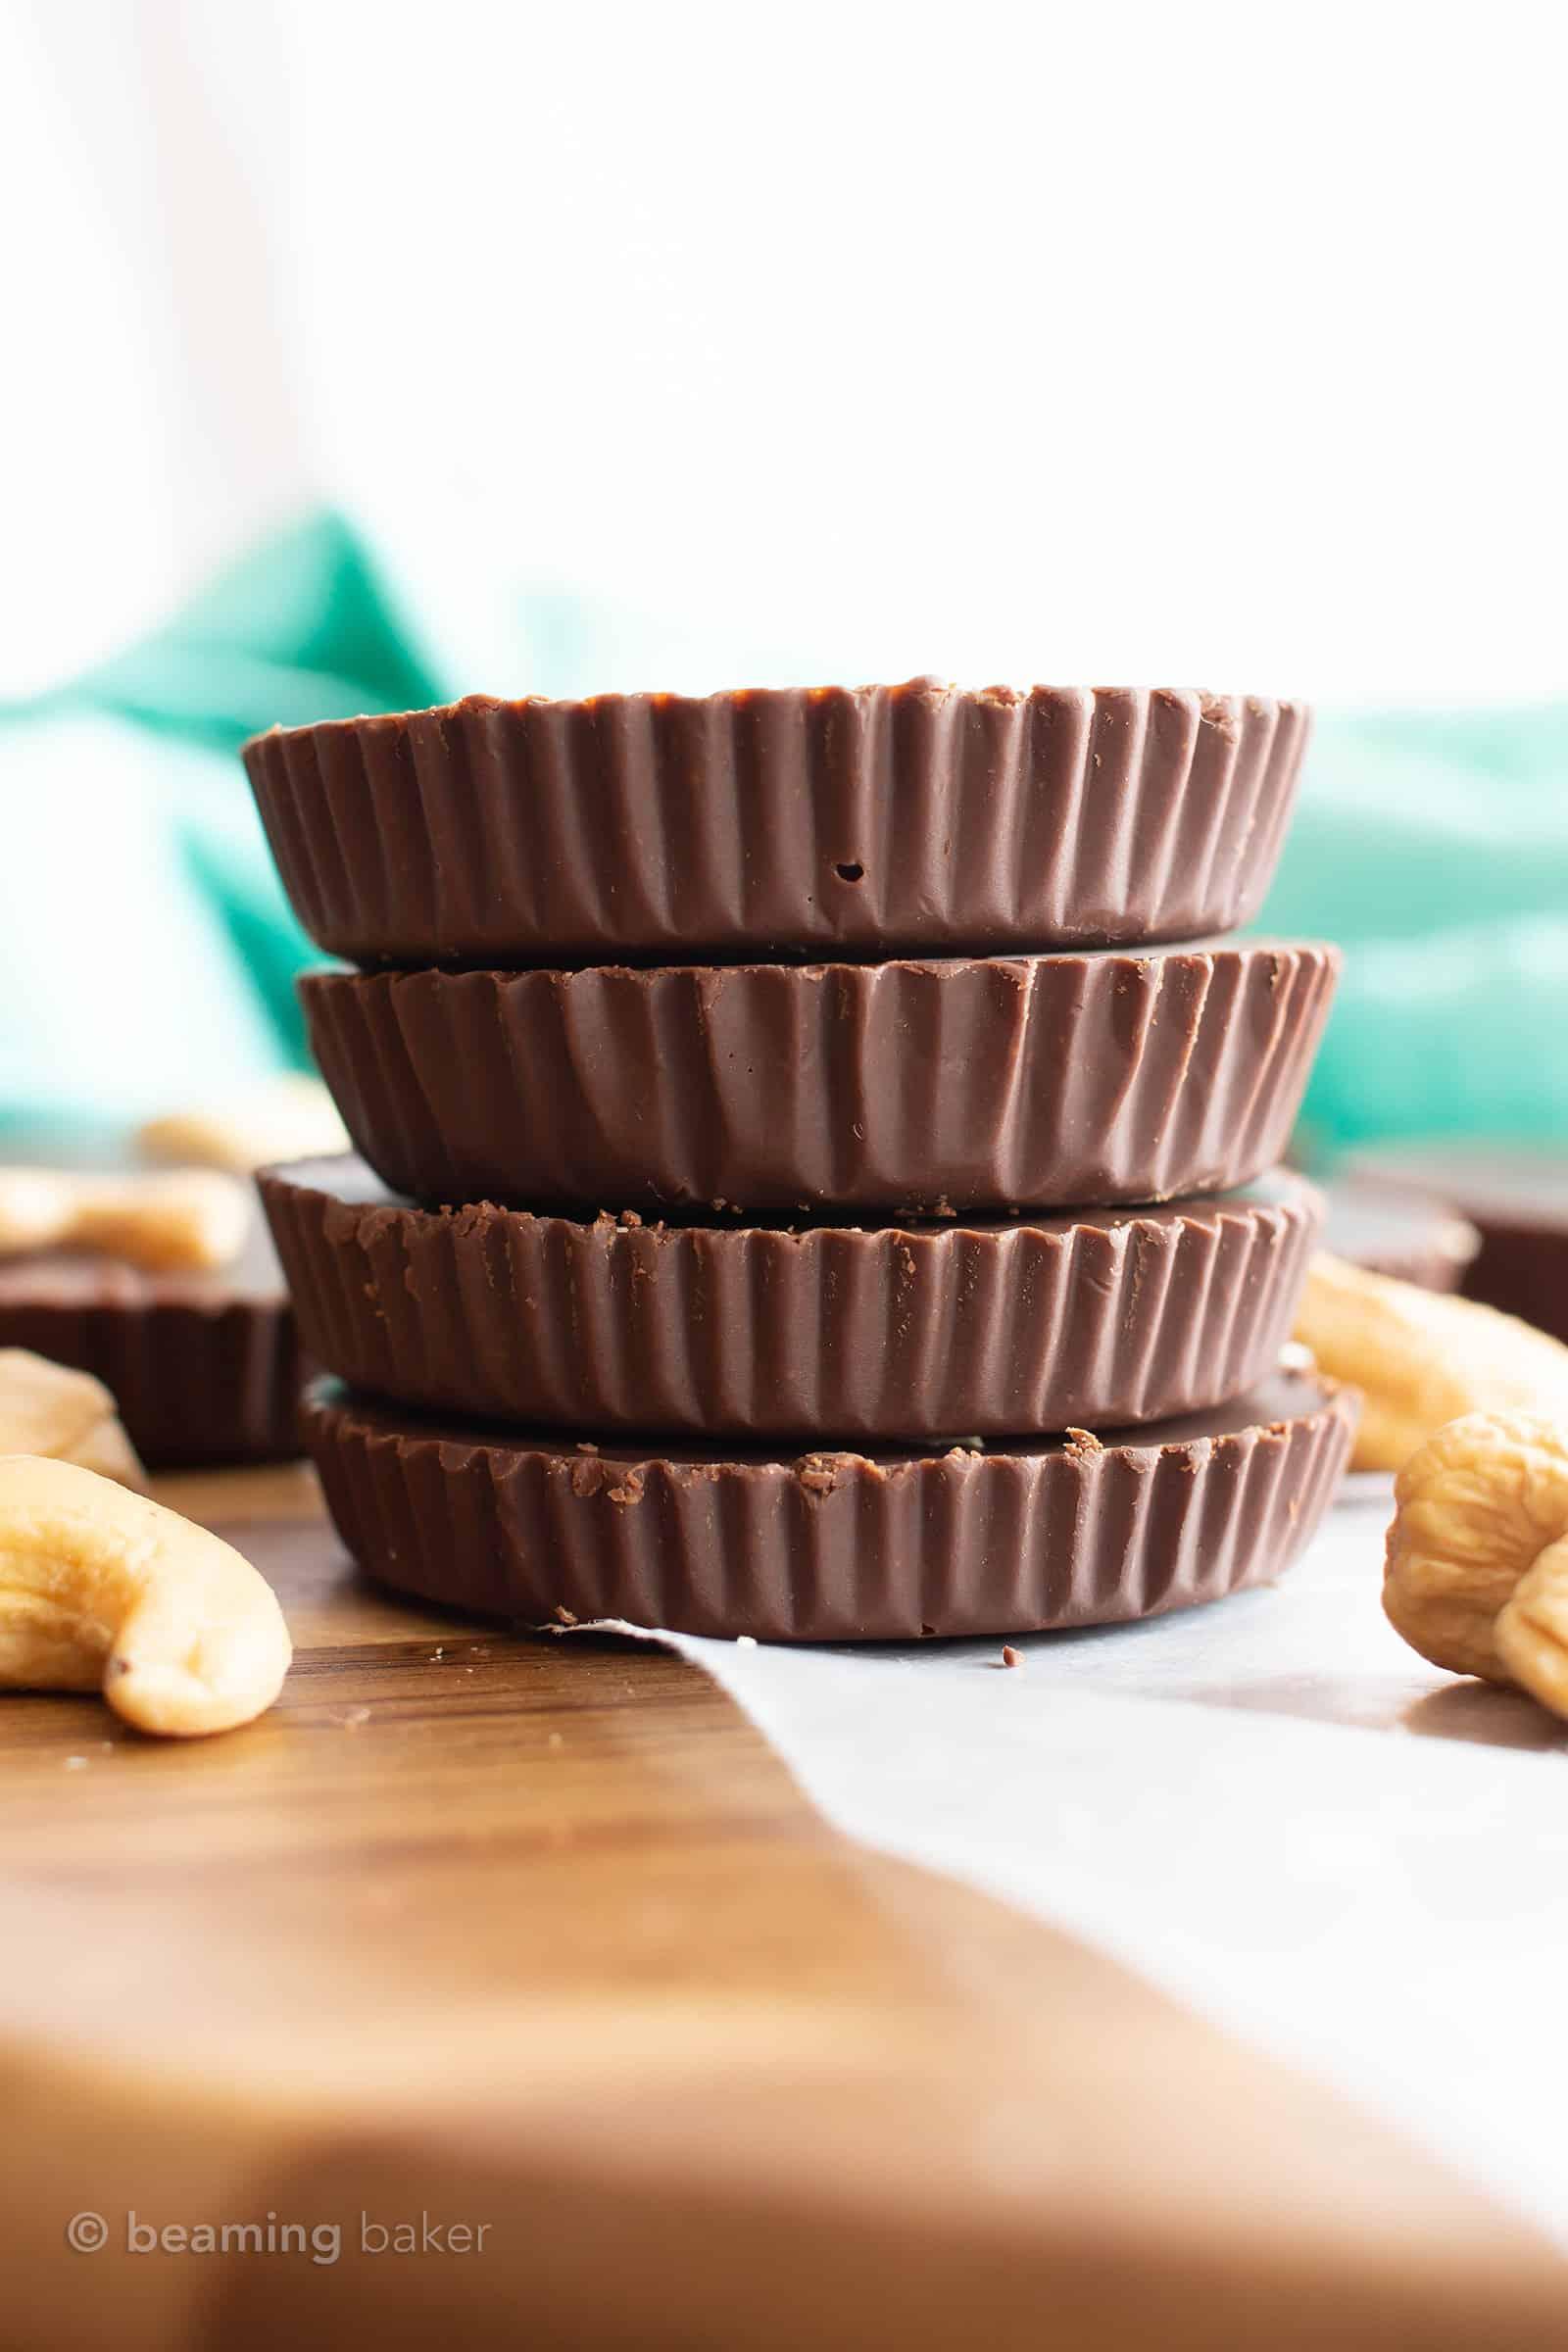 Low Carb Chocolate Fudge Cups Recipe: easy keto chocolate fudge cups made with cashew butter! The best Keto fudge recipe—low carb fudge cups bursting with rich chocolate flavor. #LowCarb #Keto #SugarFree #DairyFree   Recipe at BeamingBaker.com